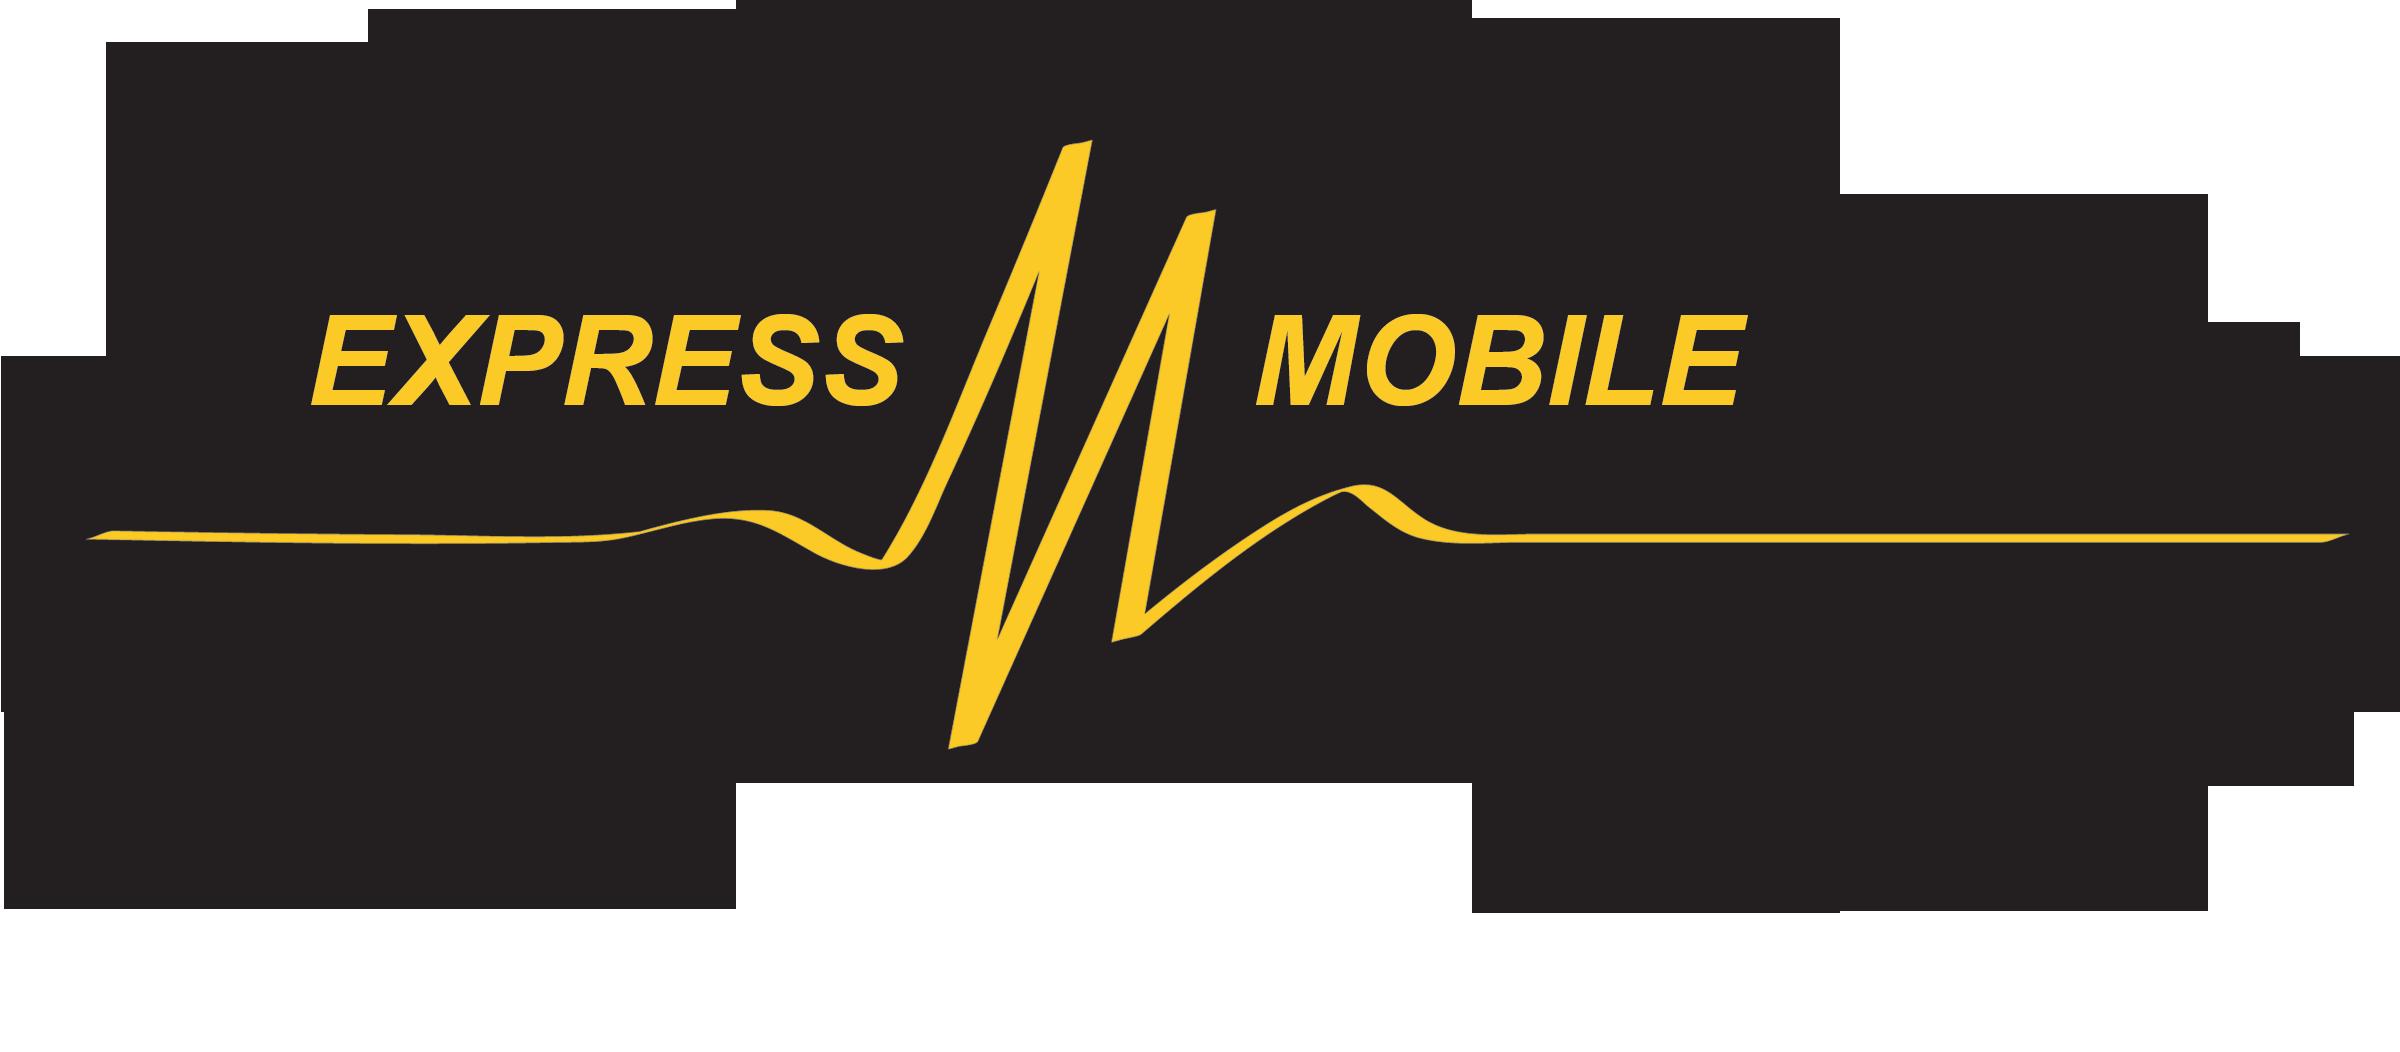 Express Mobile sponsor logo